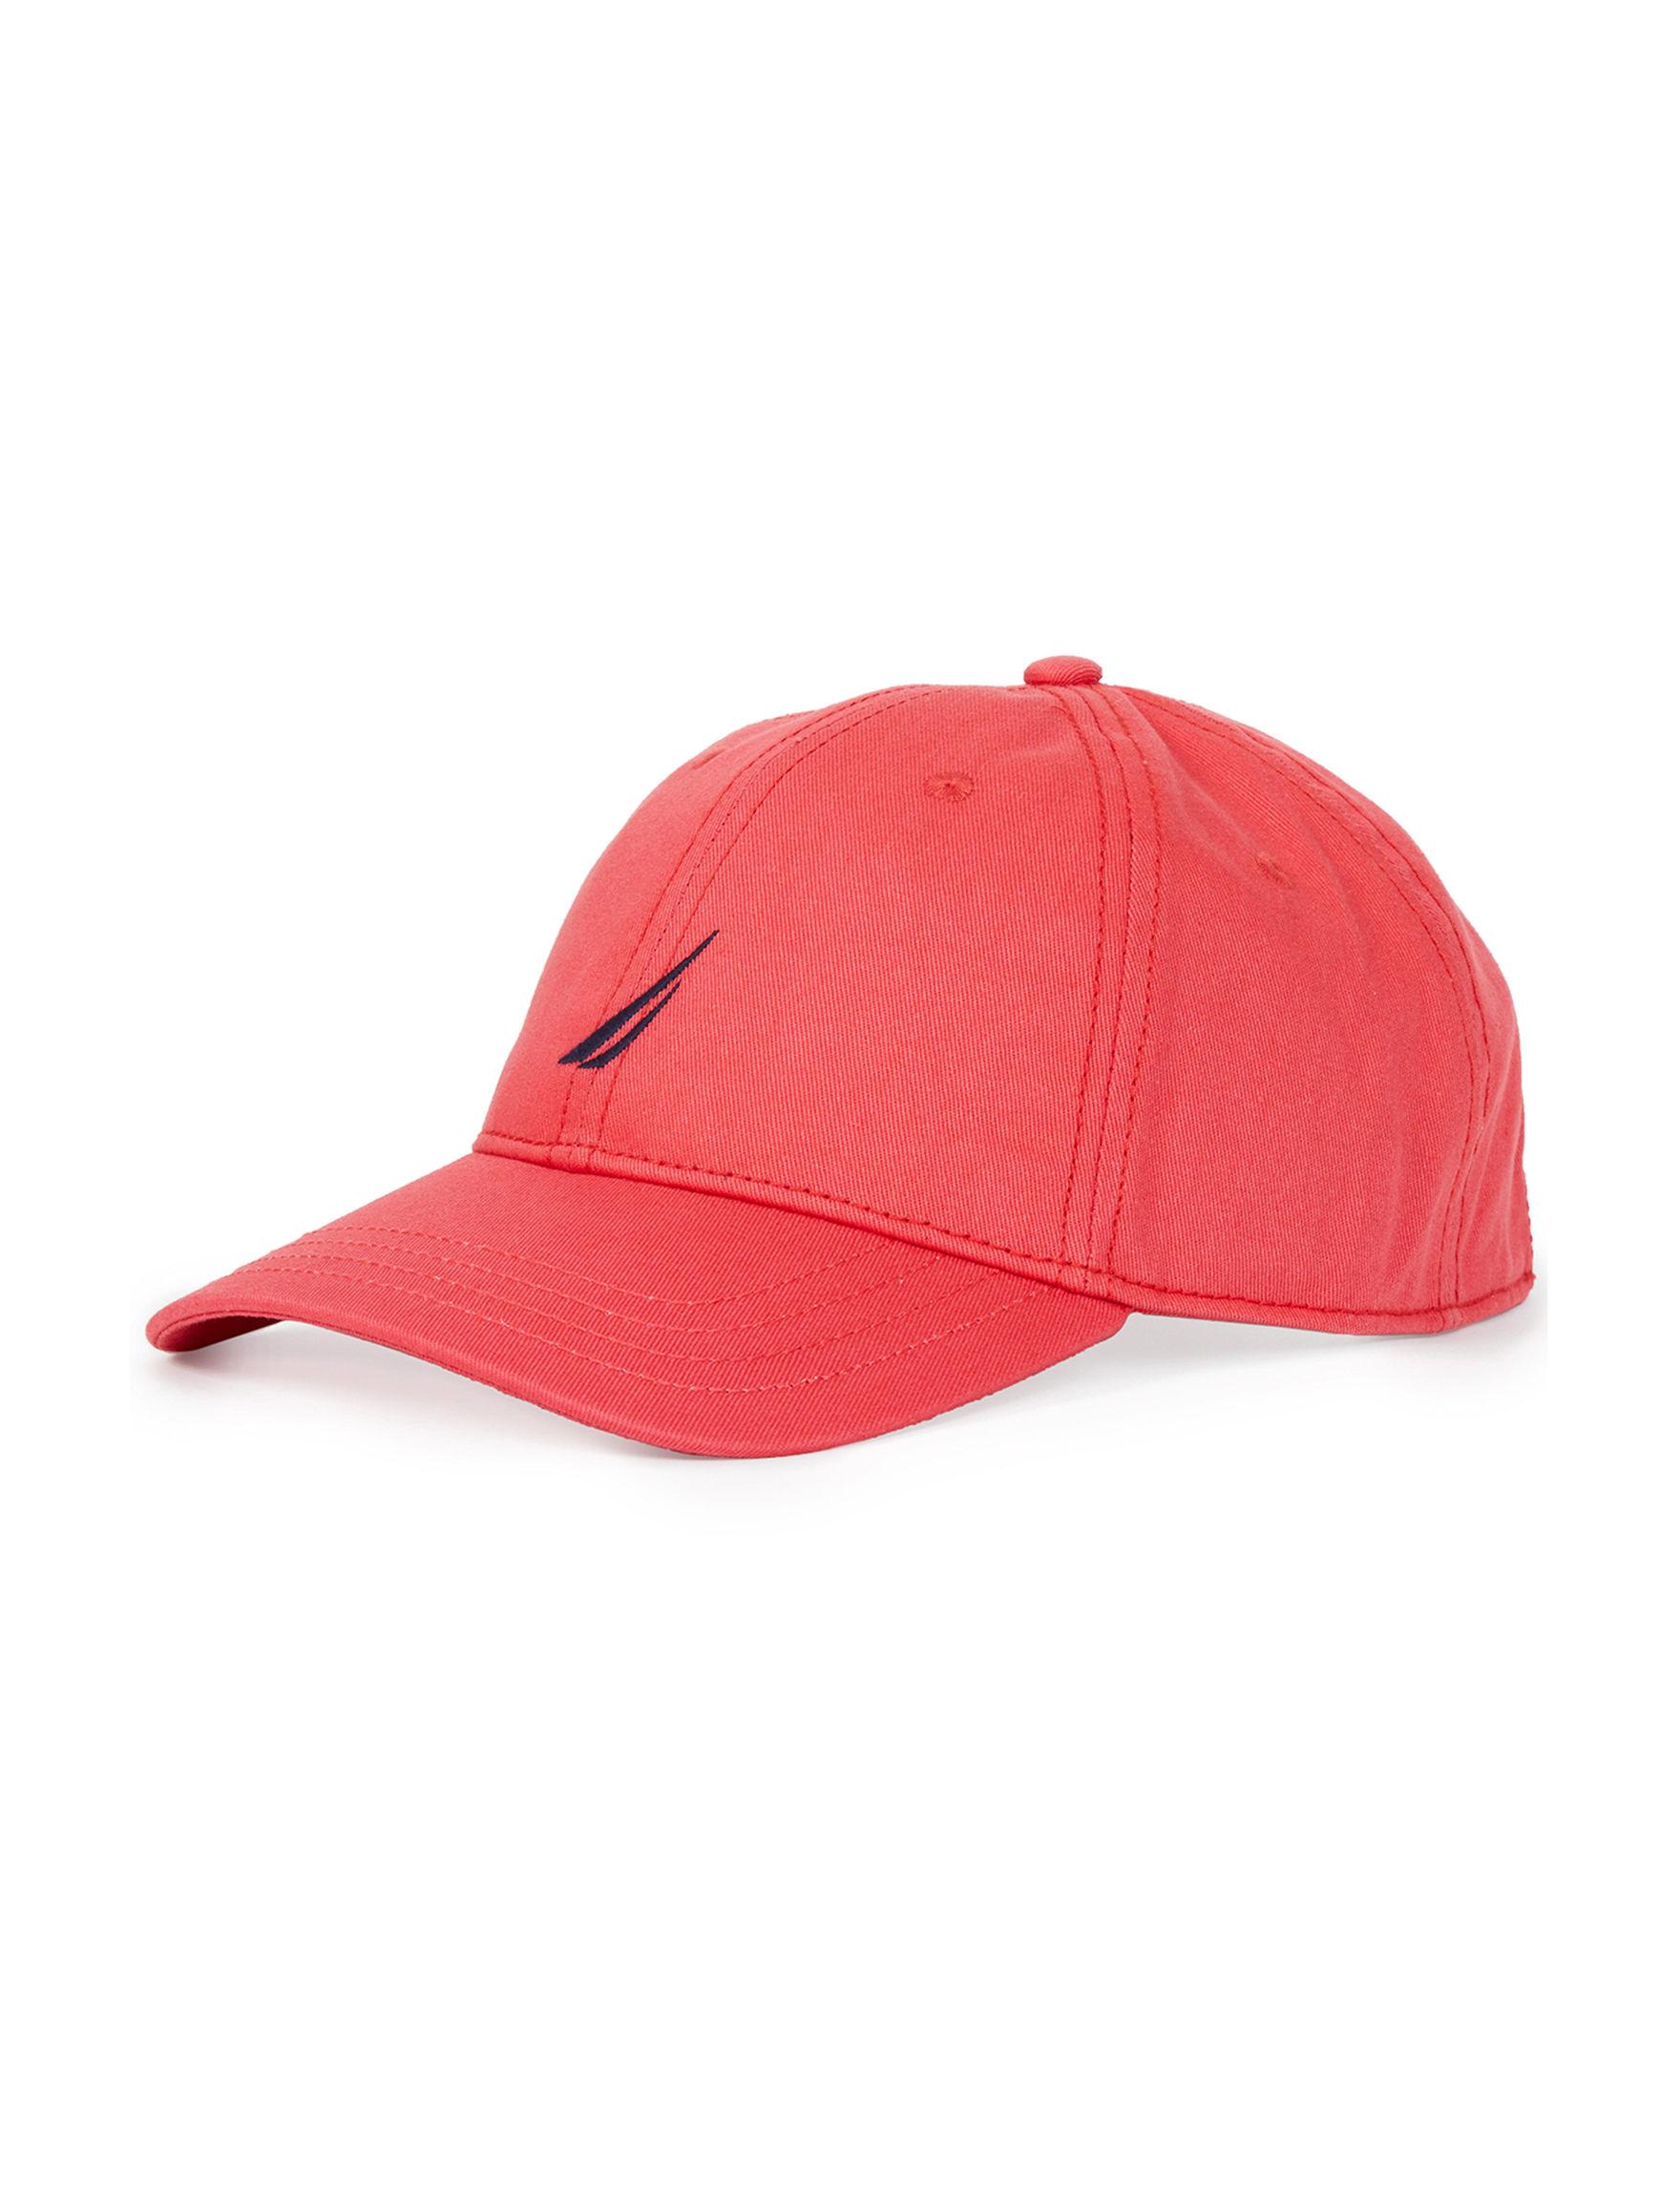 Nautica Orange Hats & Headwear